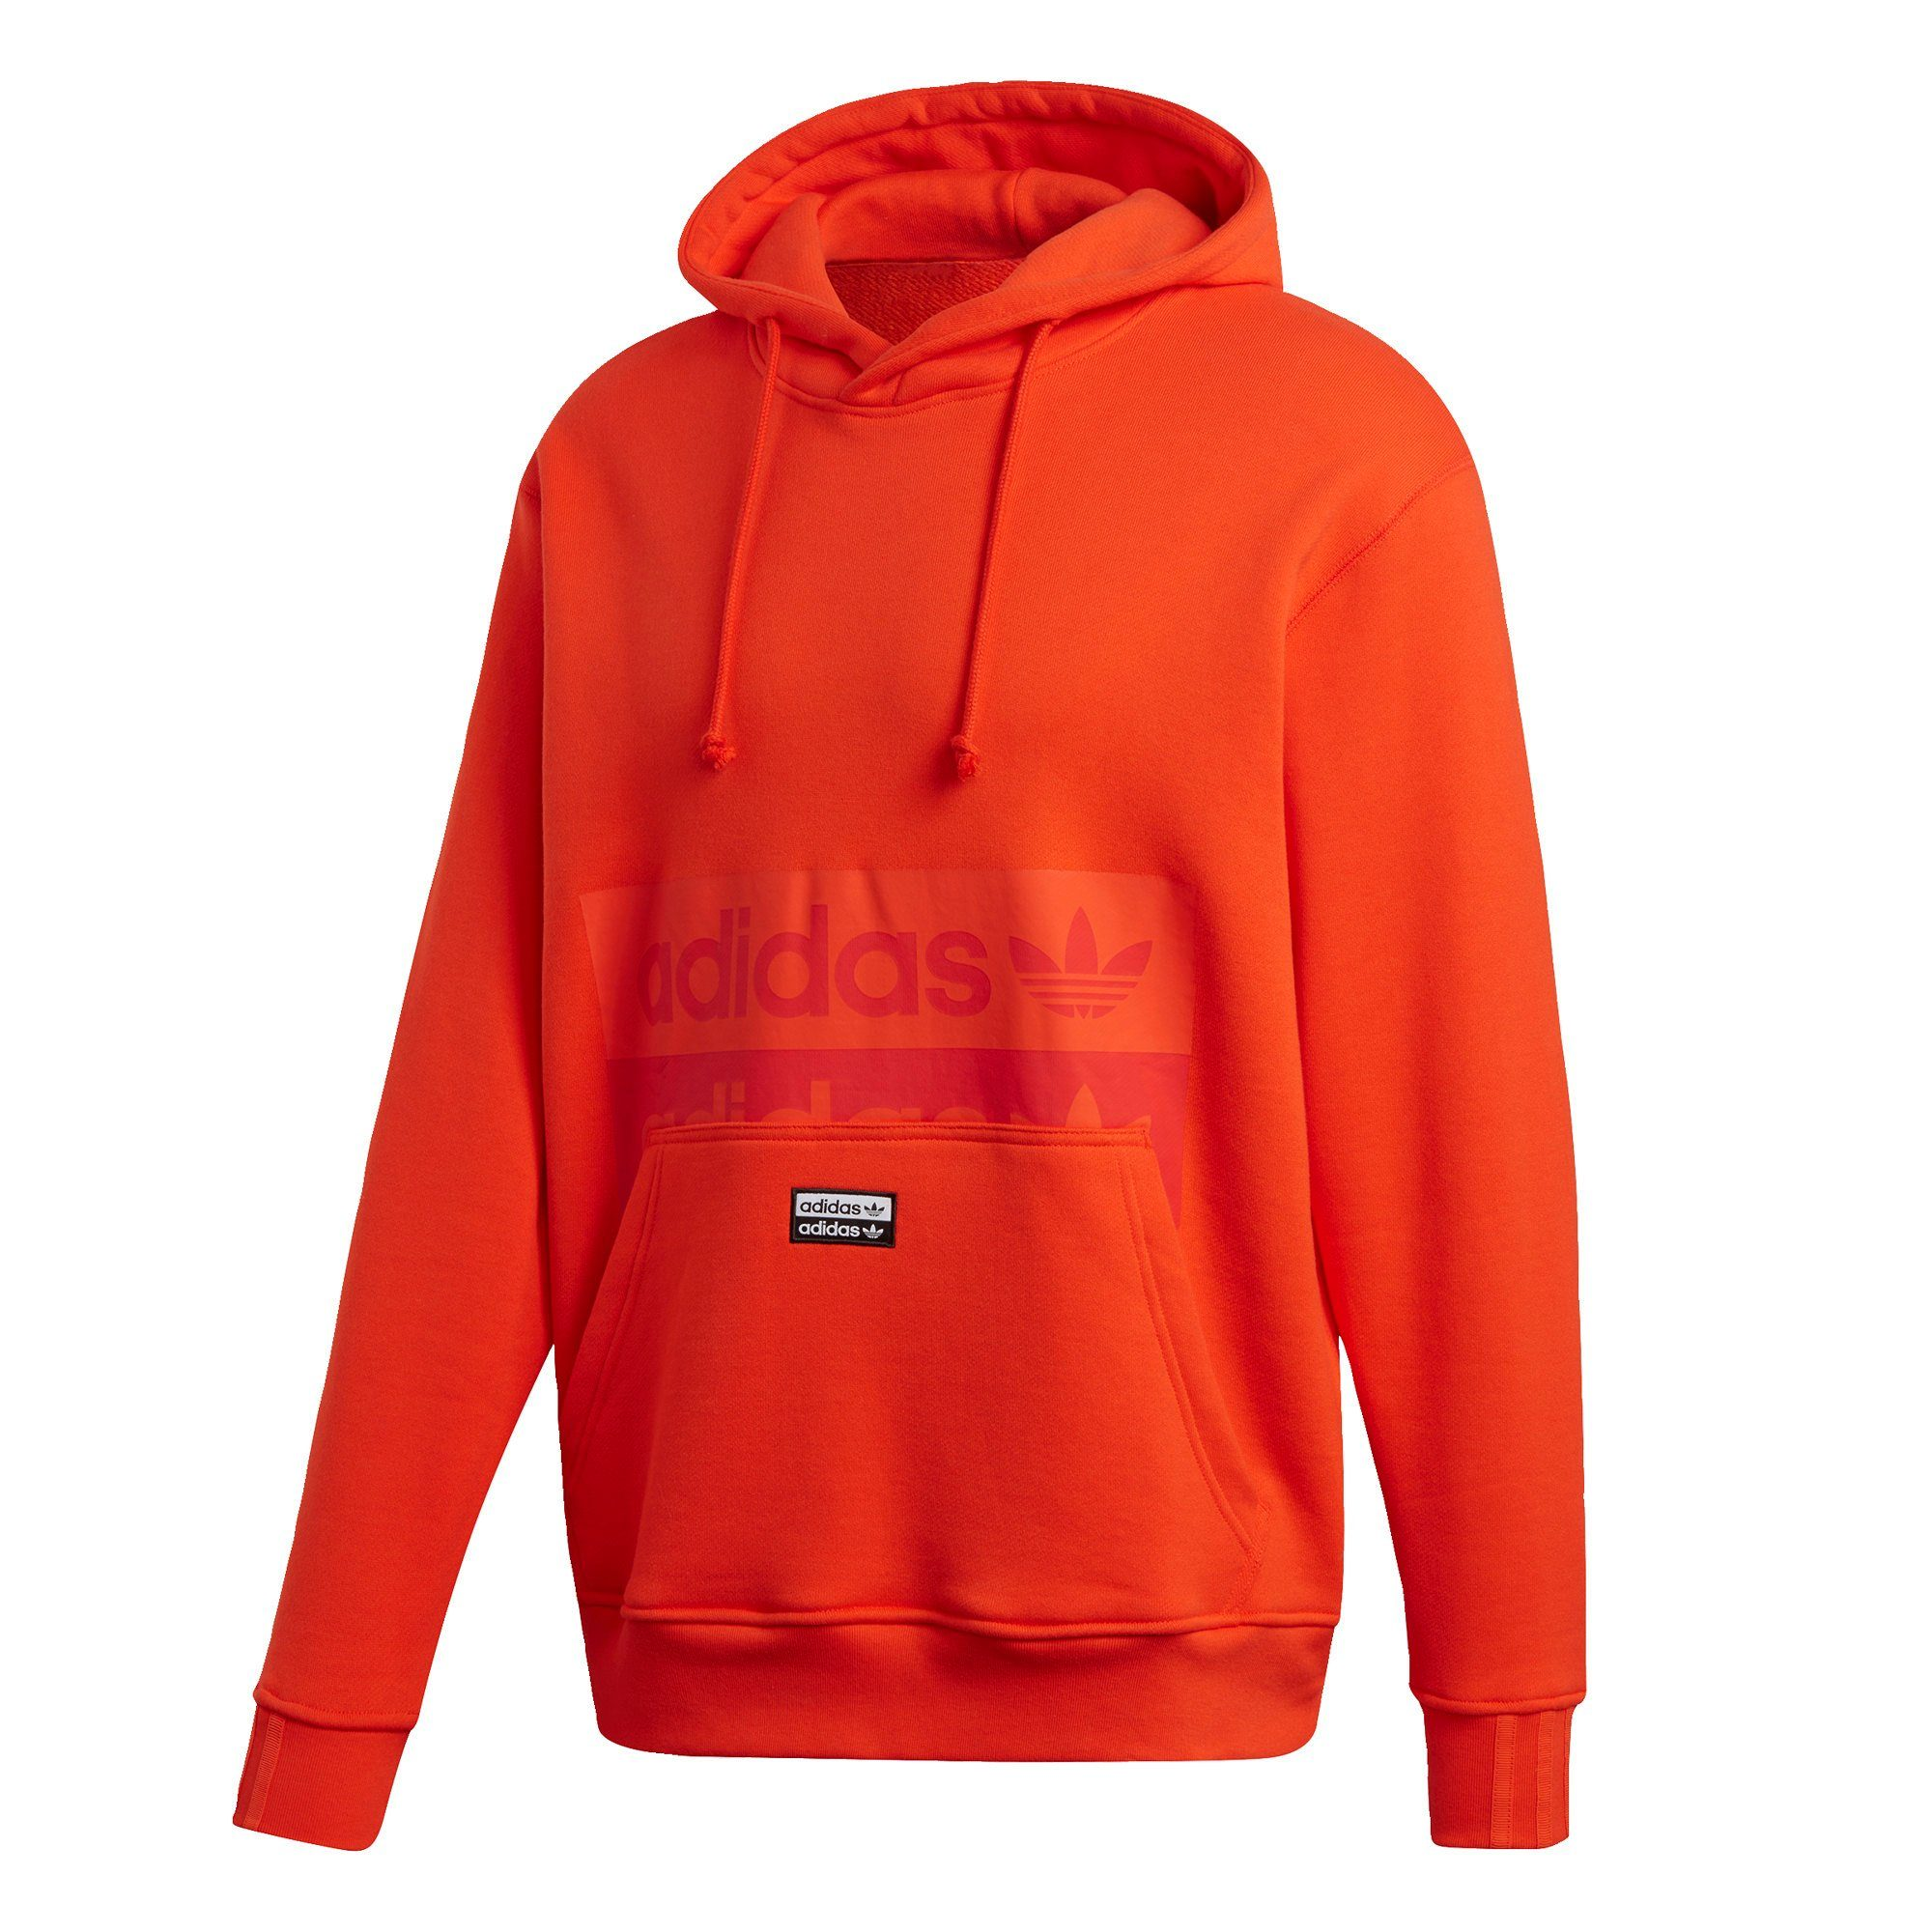 adidas Originals Hoodie »R.Y.V. Hoodie« Ryv kaufen   OTTO